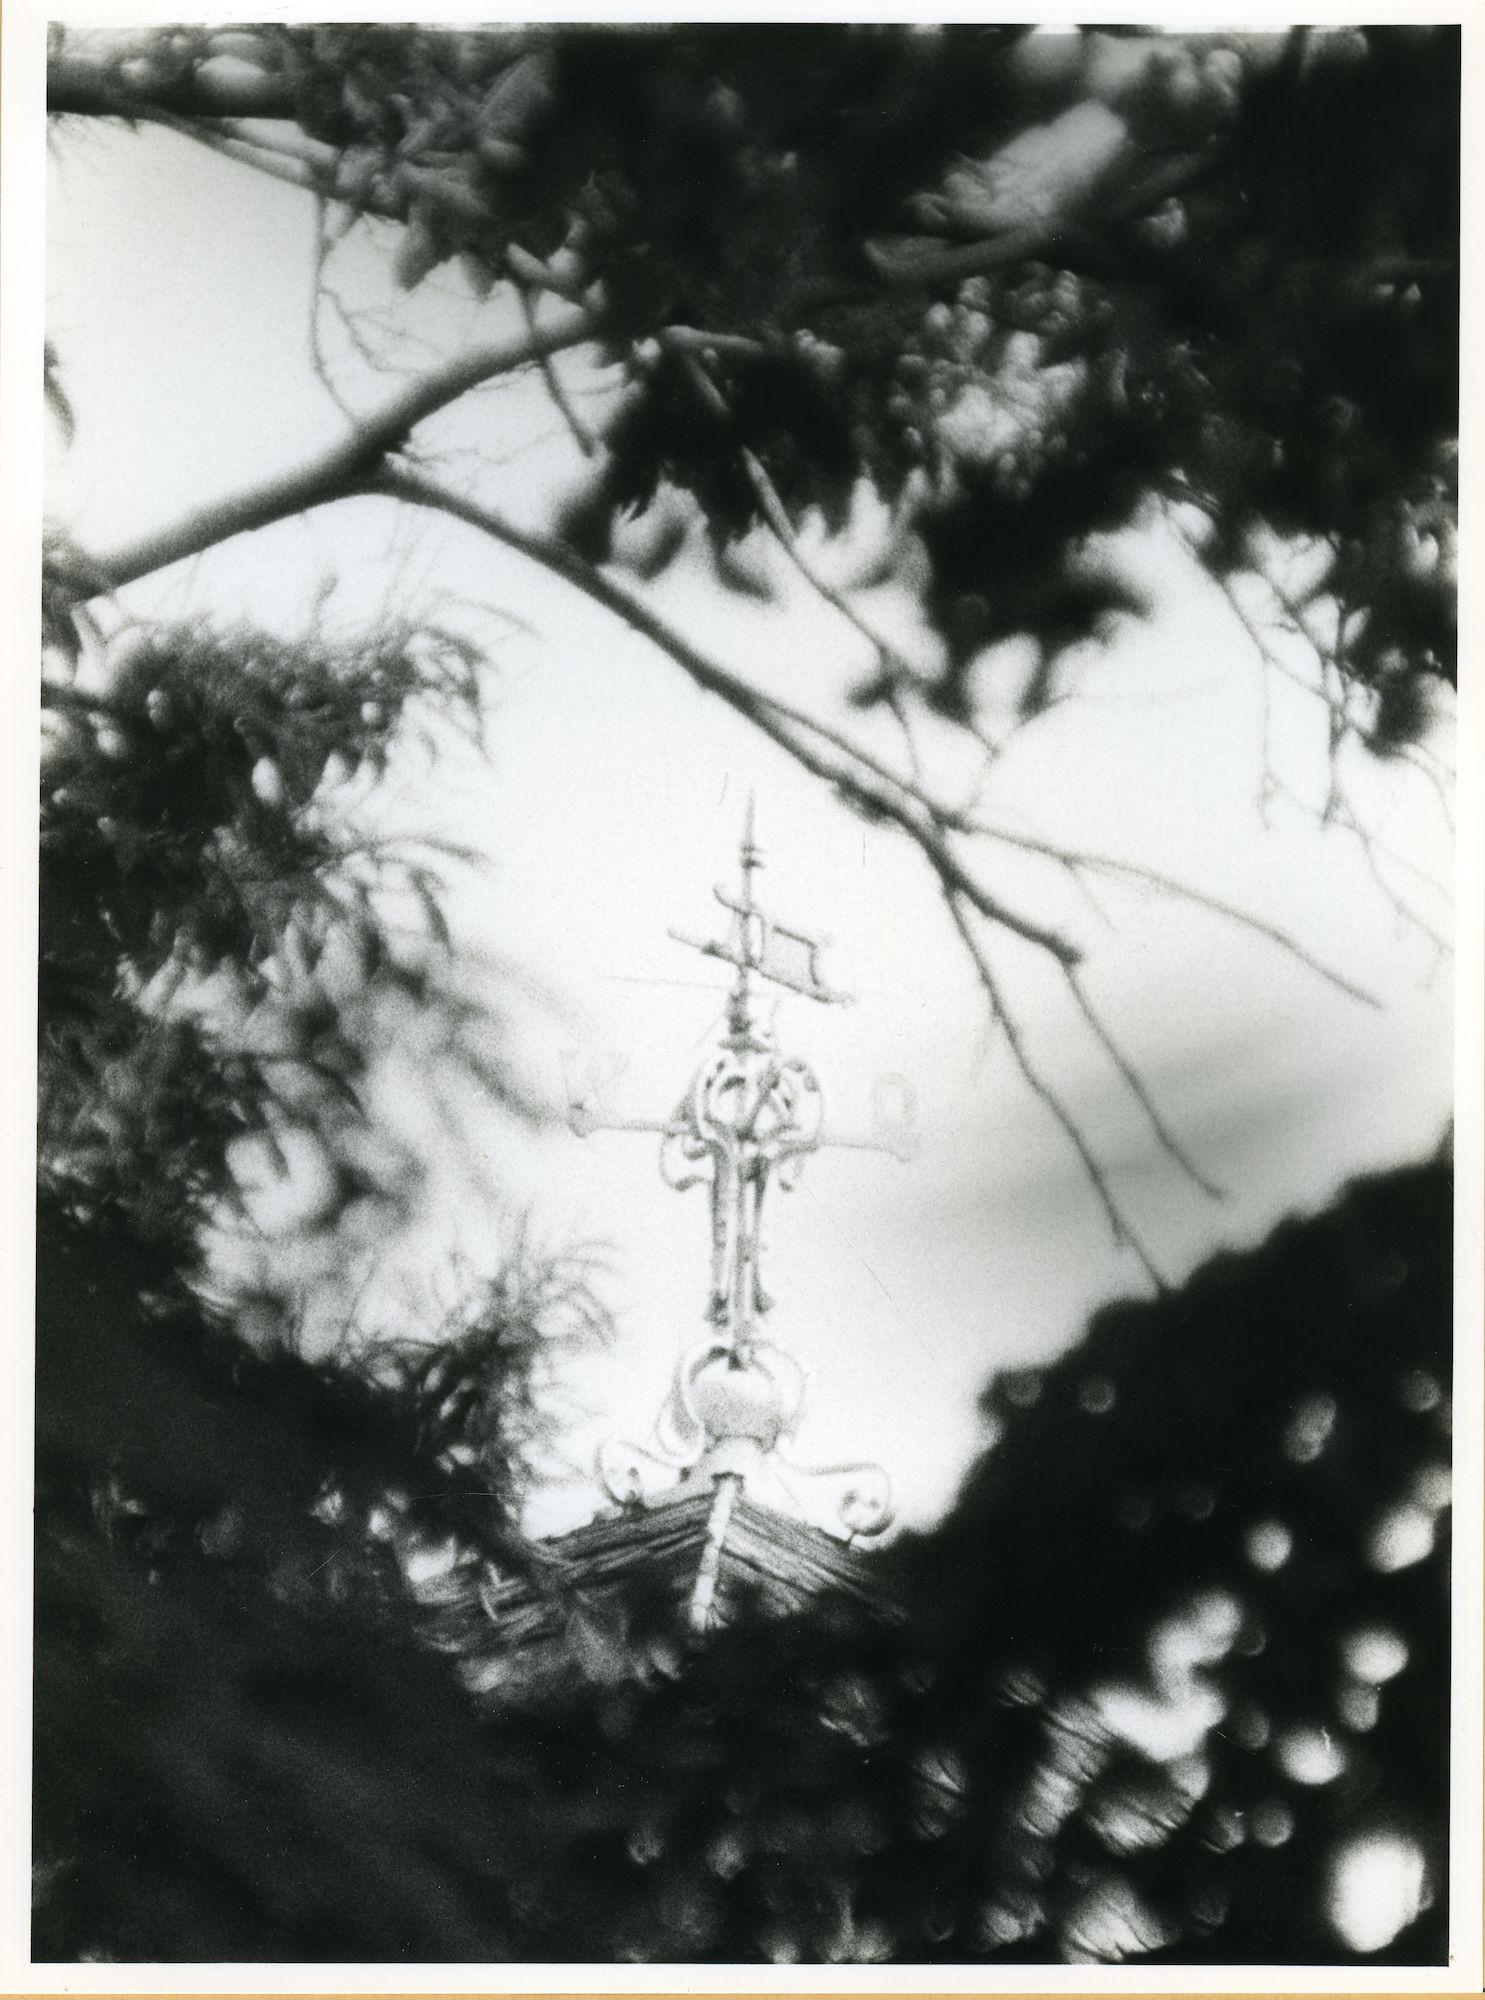 St.-Amandsberg: Beelbroekstraat 32: Nokversiering, 1979